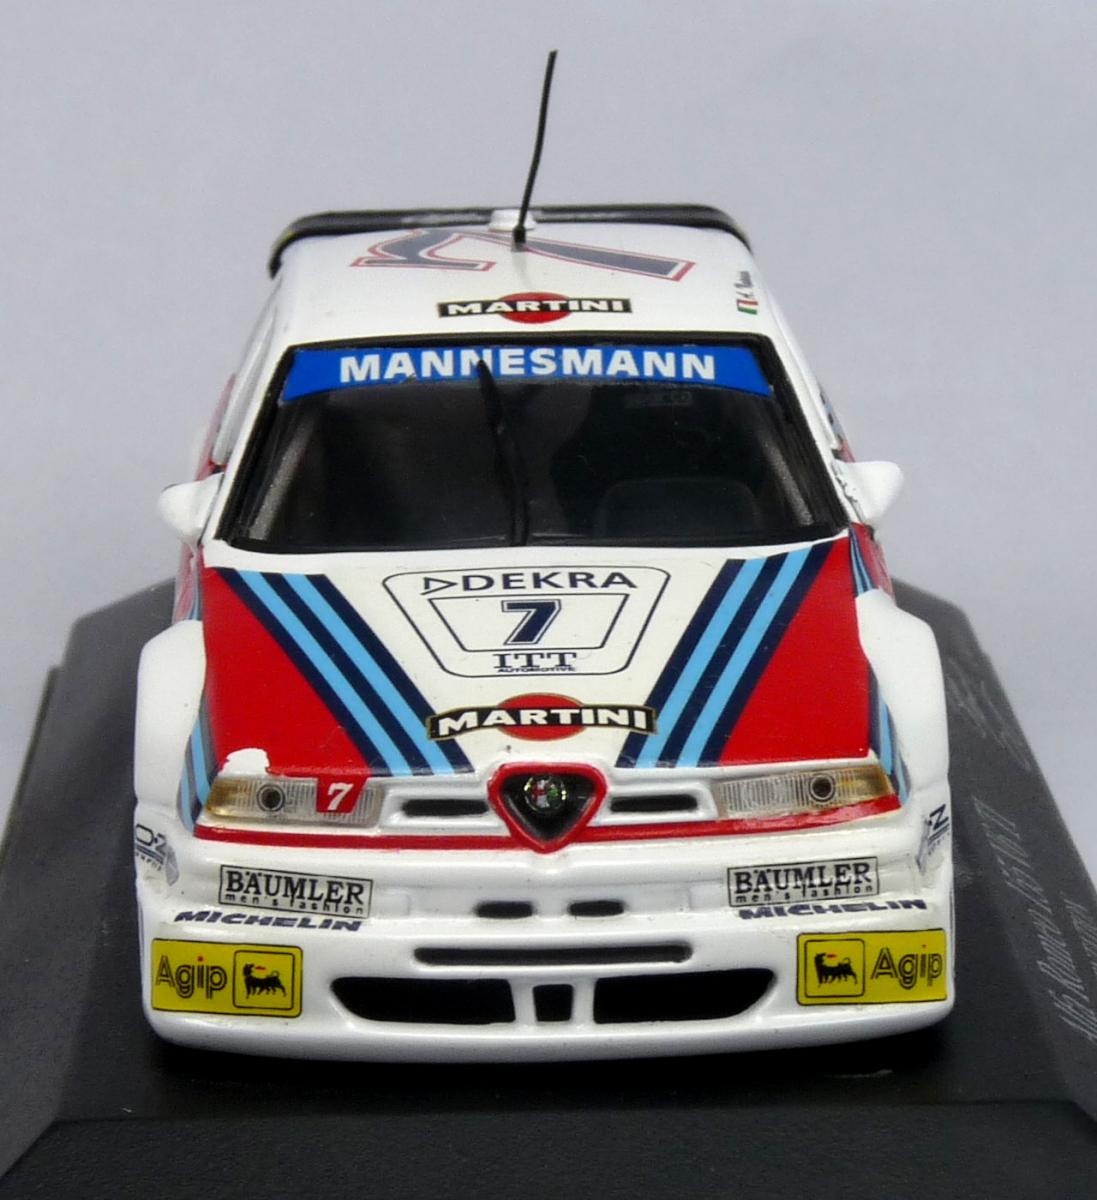 Minichamps Alfa Romeo 155 V6 TI DTM 95 Präsentation A